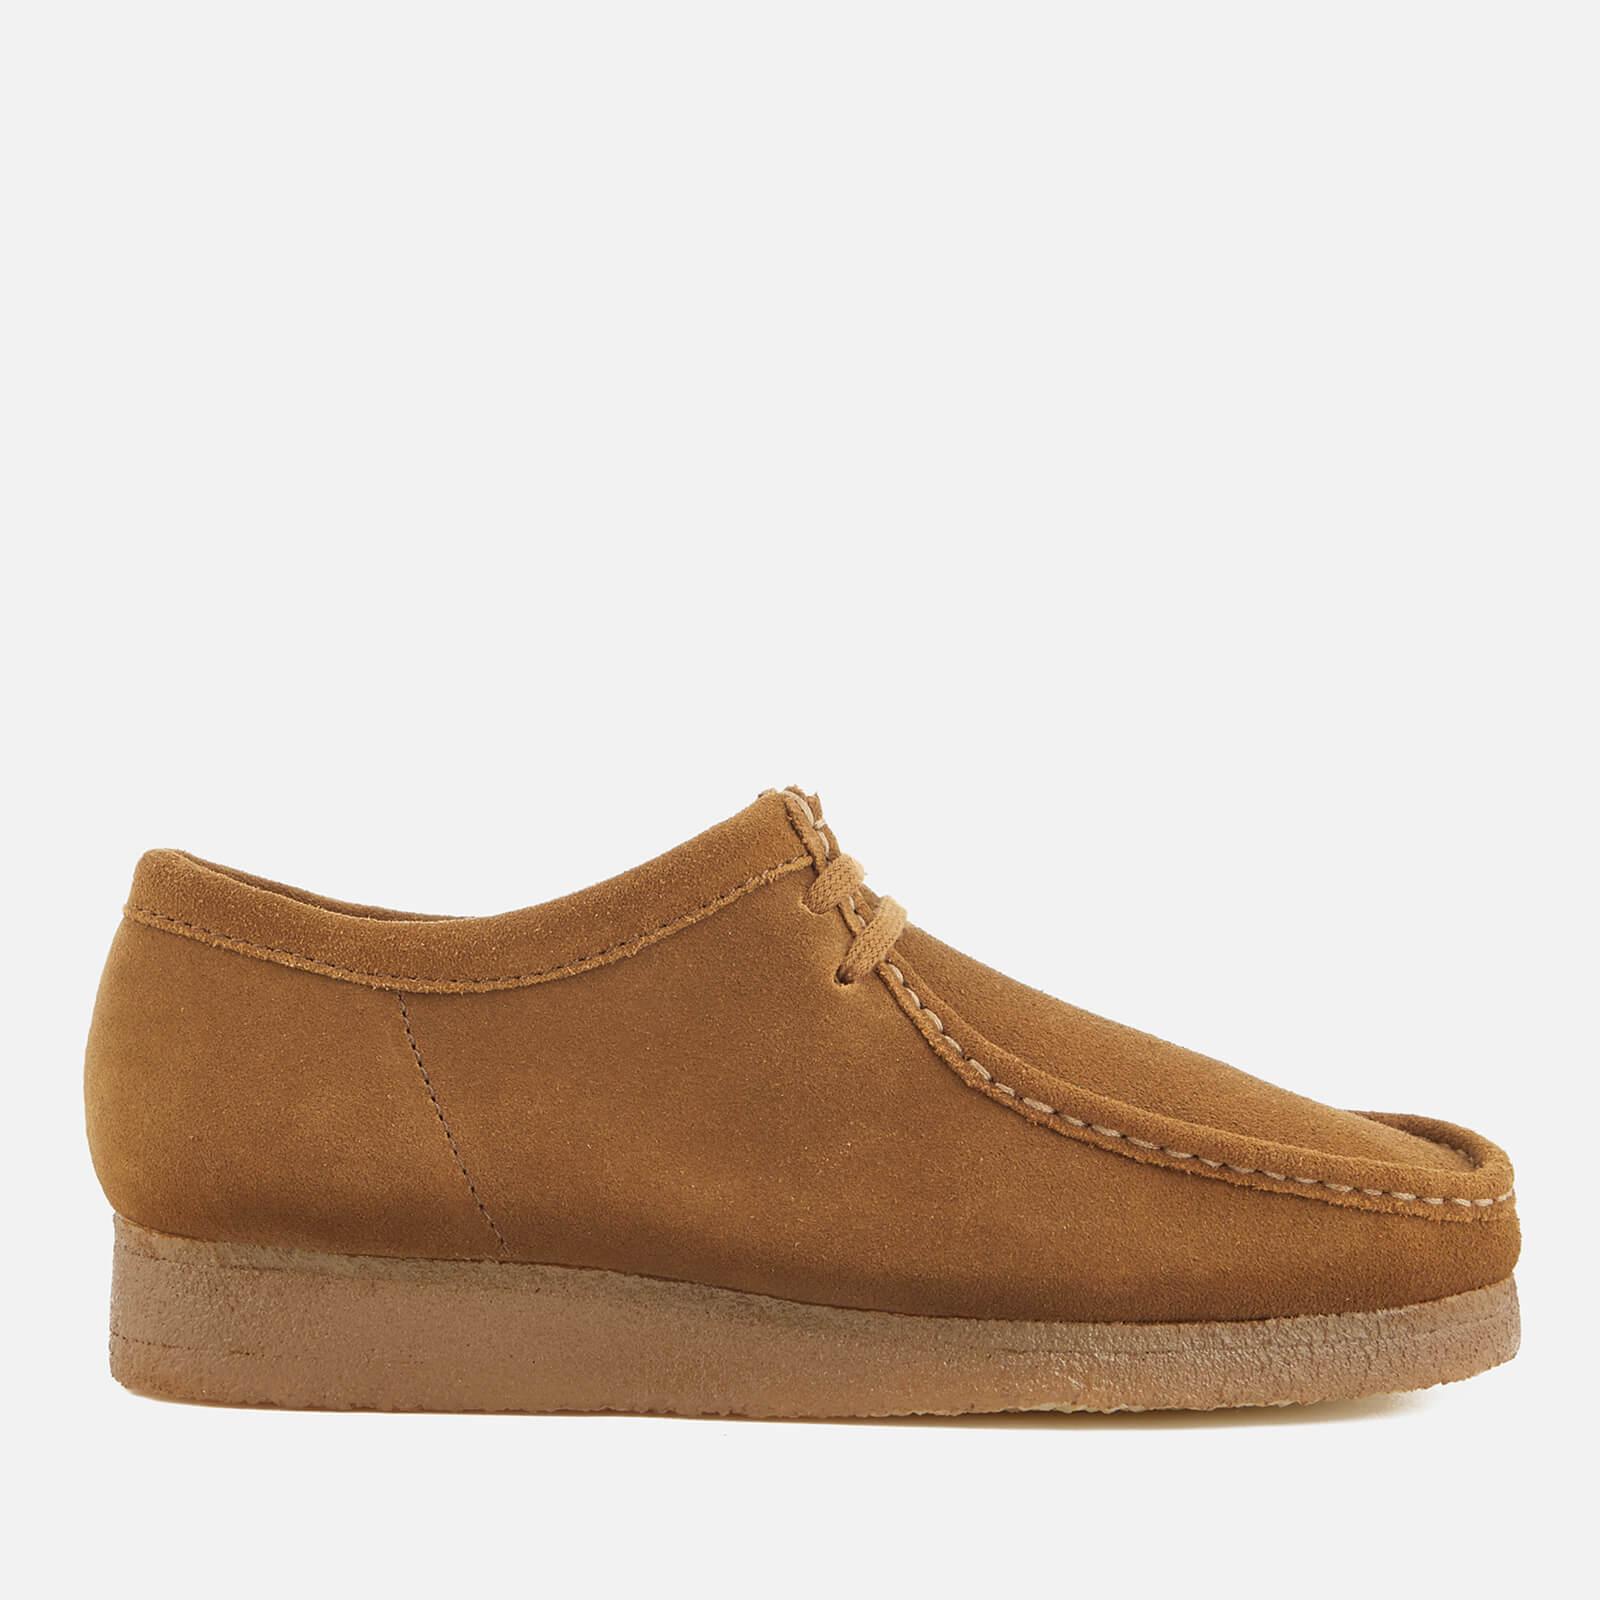 Clarks Originals Men's Wallabee Suede Shoes - Cola - UK 7 - Tan